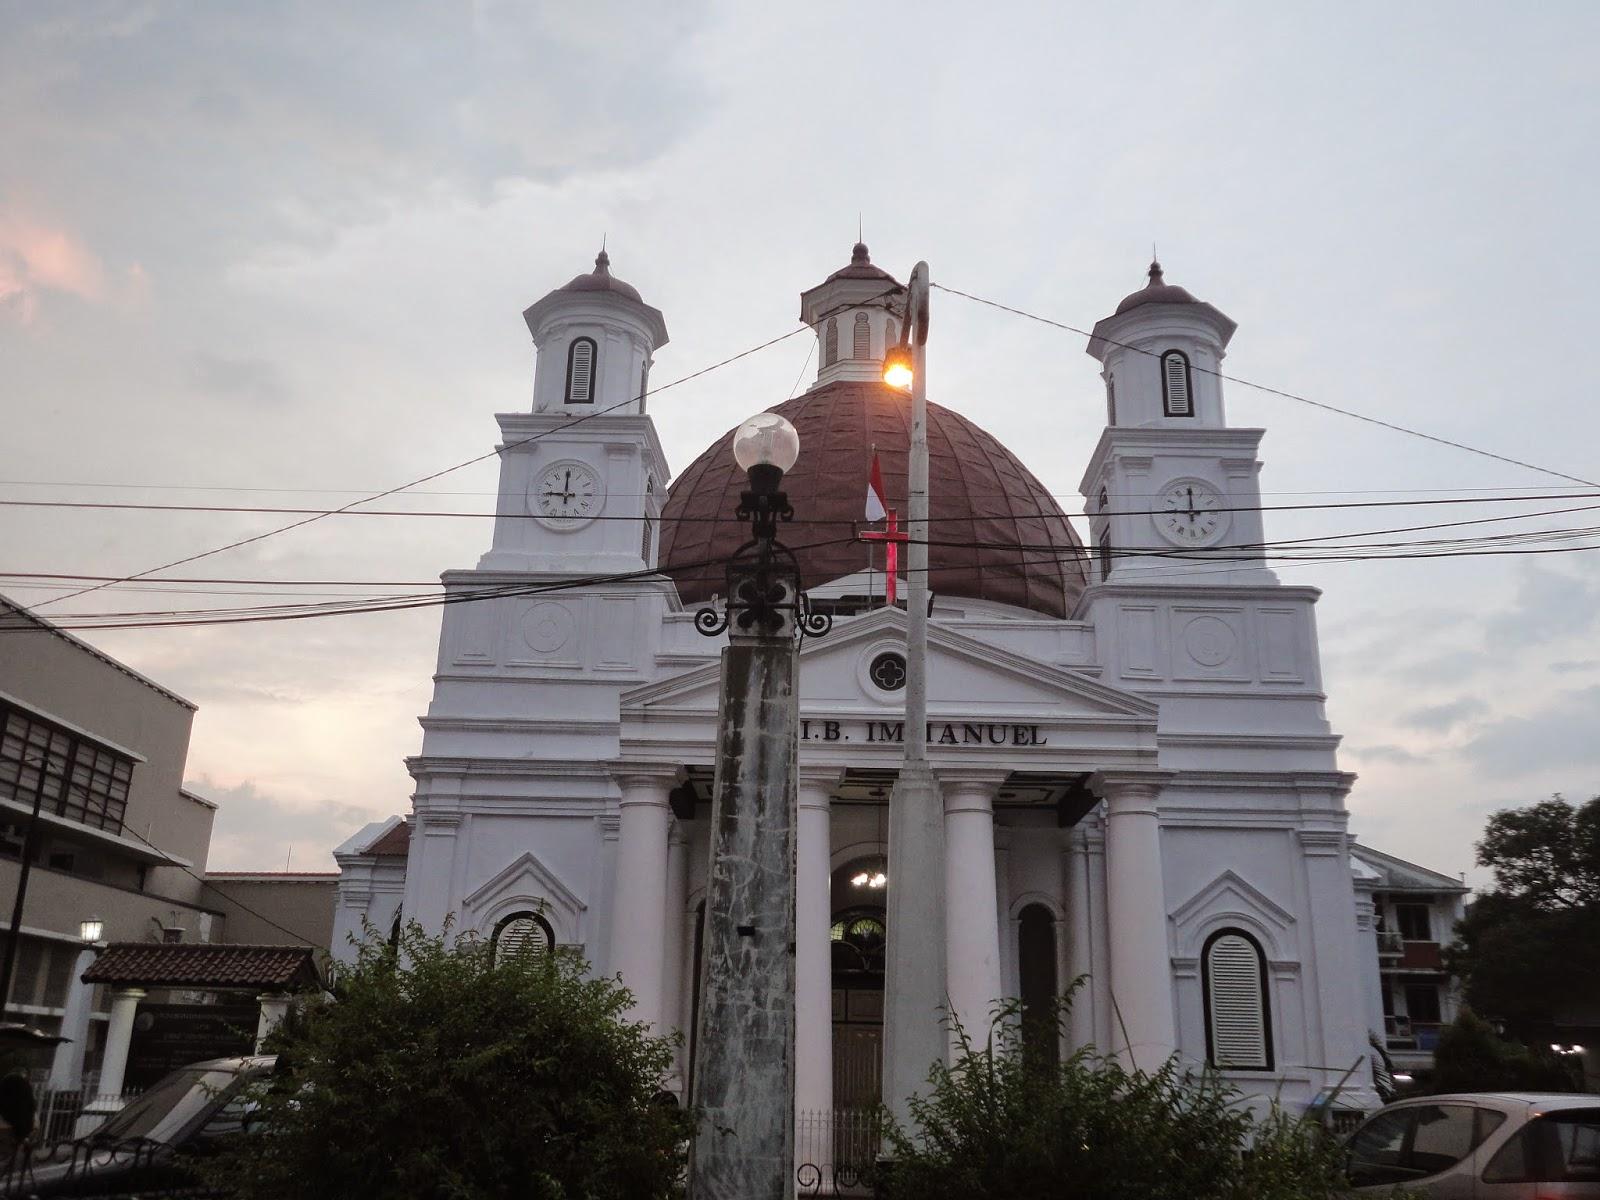 Coretan Sederhana 2015 Gereja Blenduk Kadang Dieja Blendug Seringkali Dilafazkan